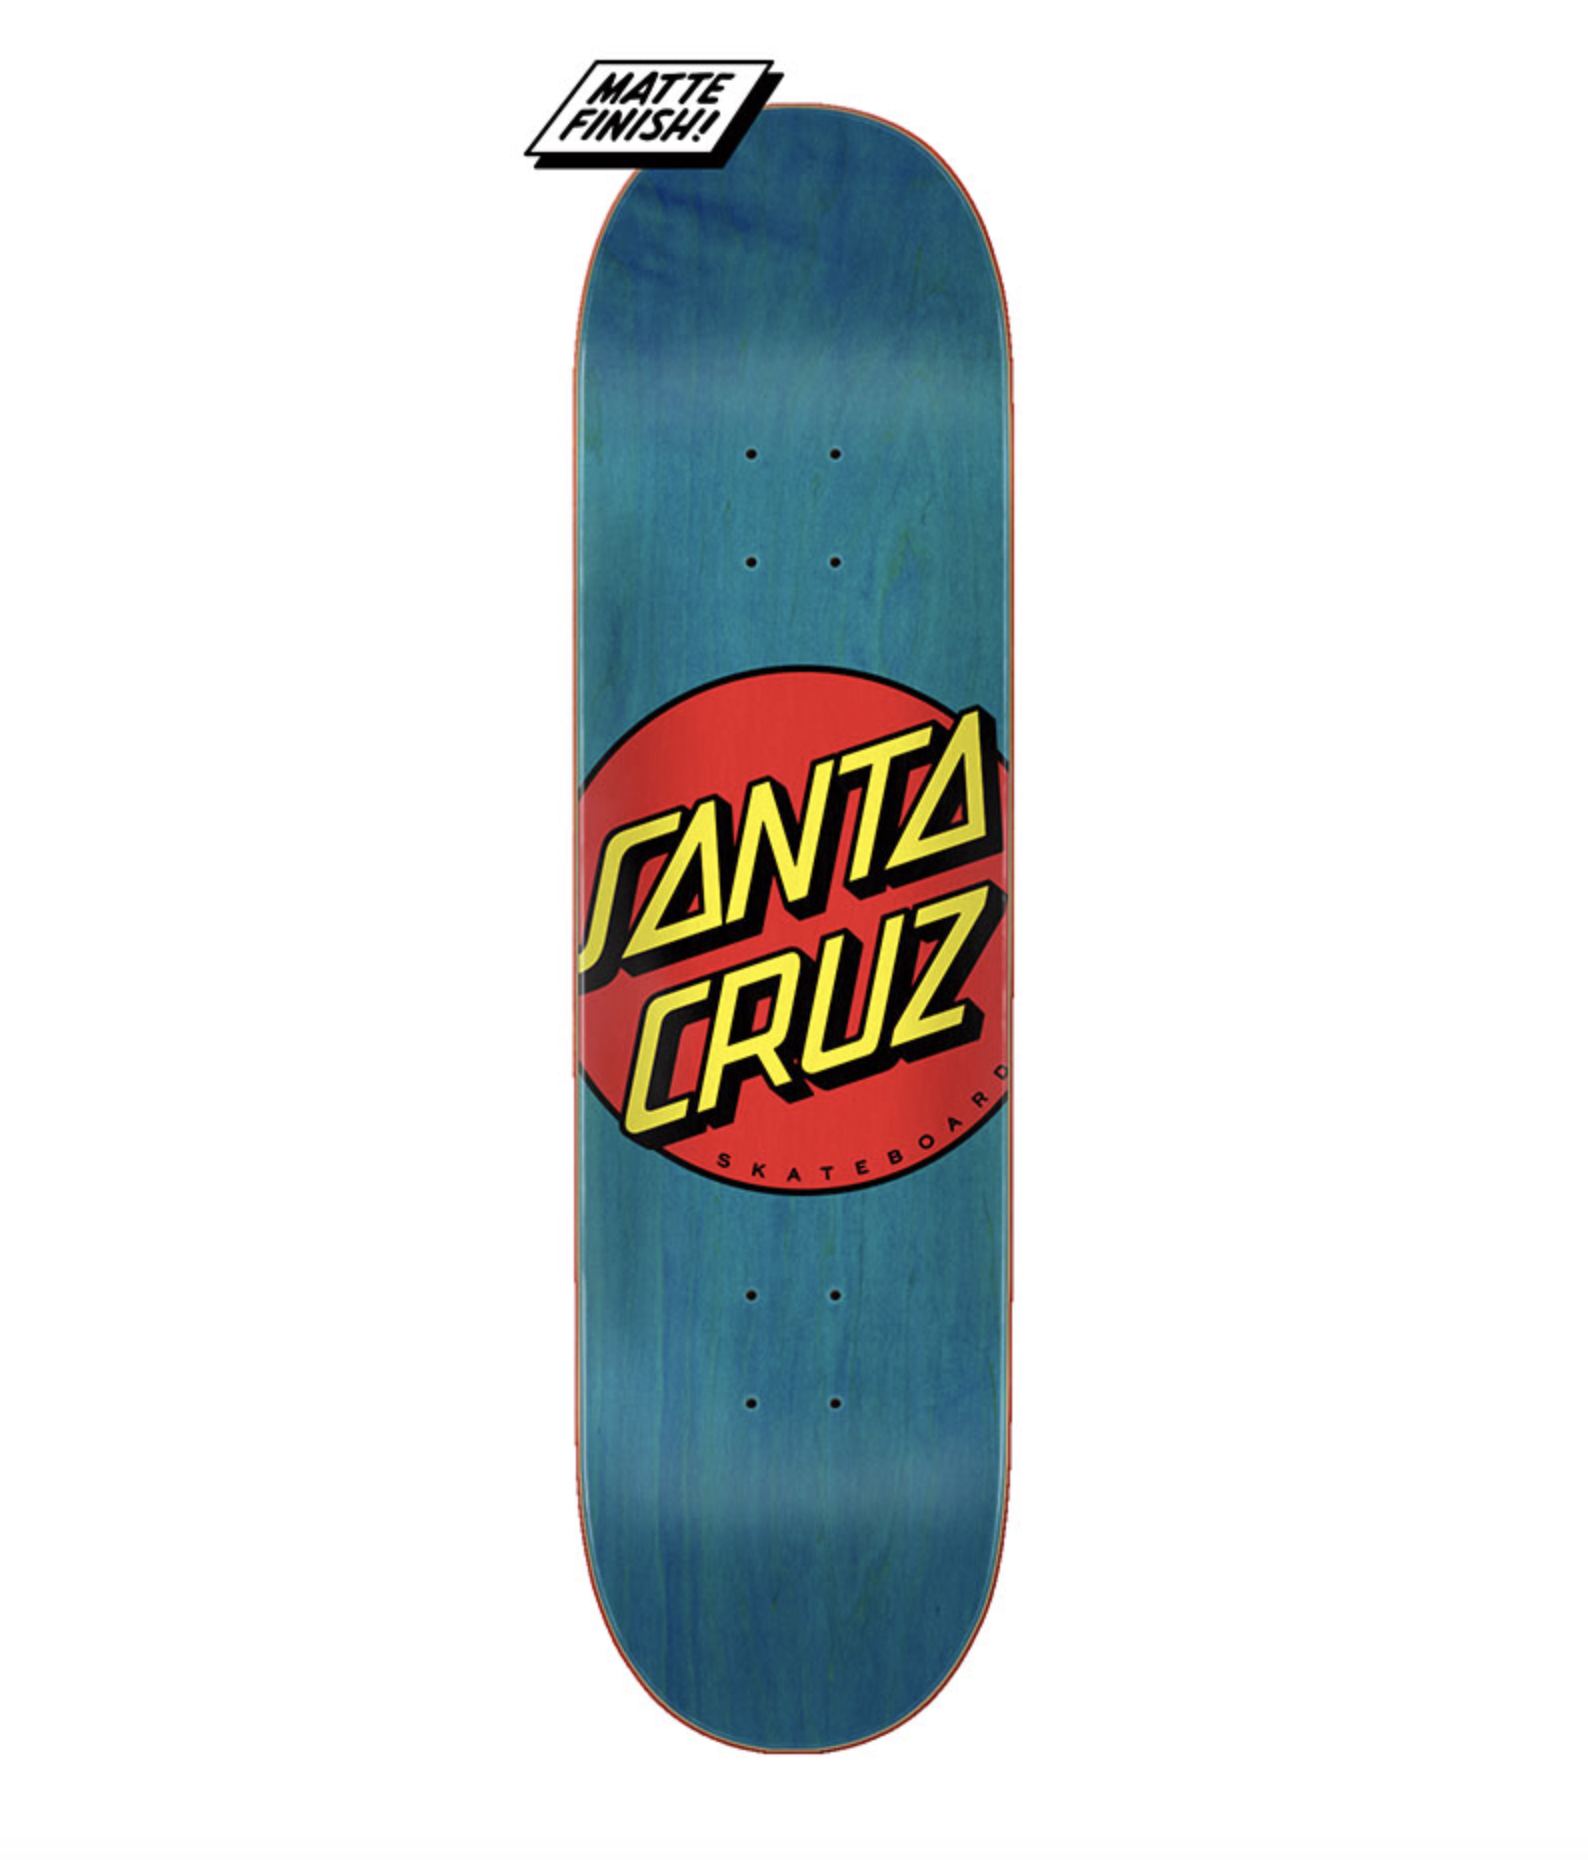 Santa Cruz DECK-SANTA CRUZ CLASSIC DOT (8.5)